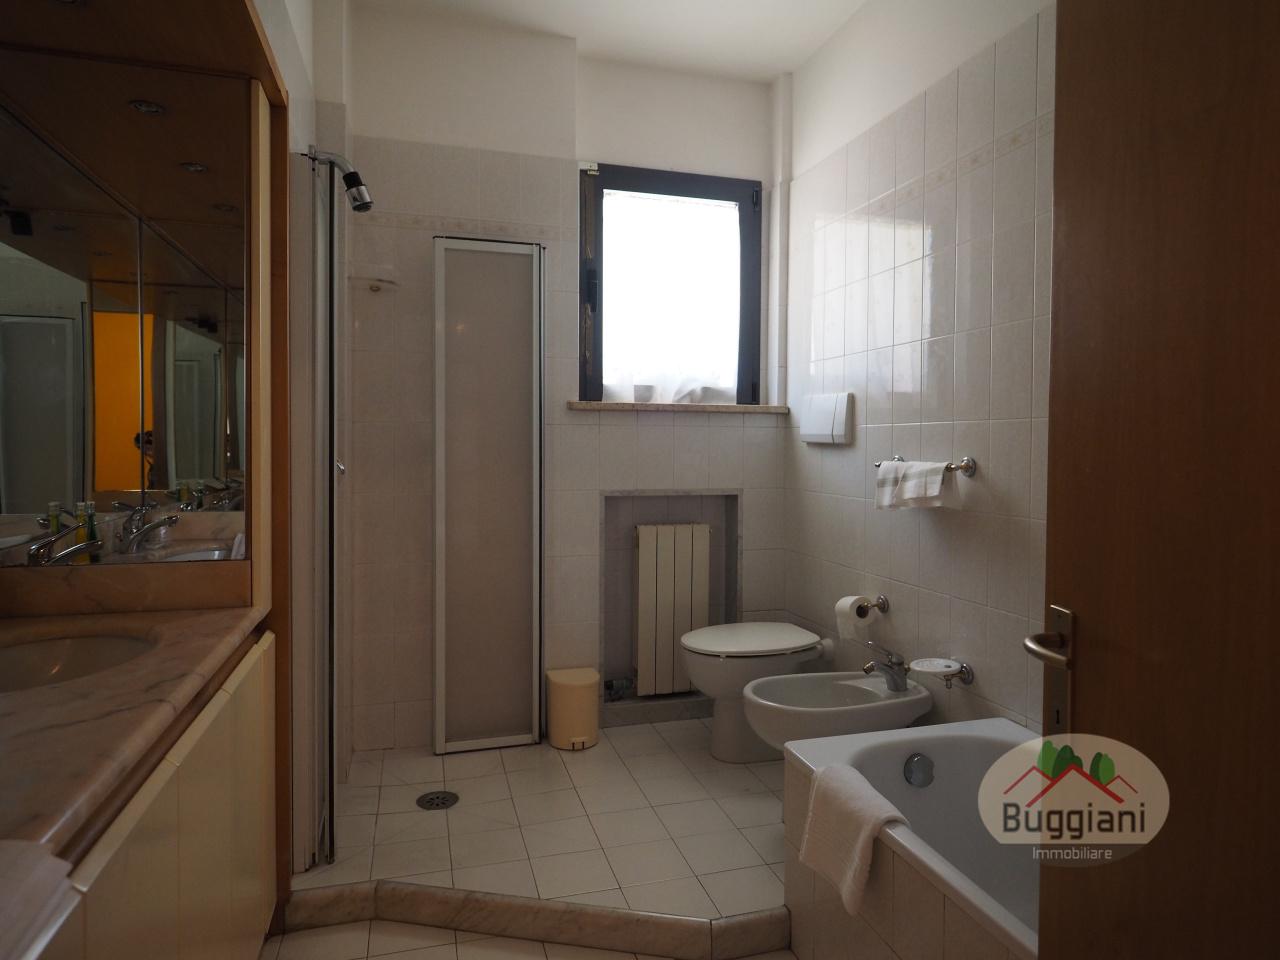 Appartamento in vendita RIF. 1796, Montopoli in Val d'Arno (PI)